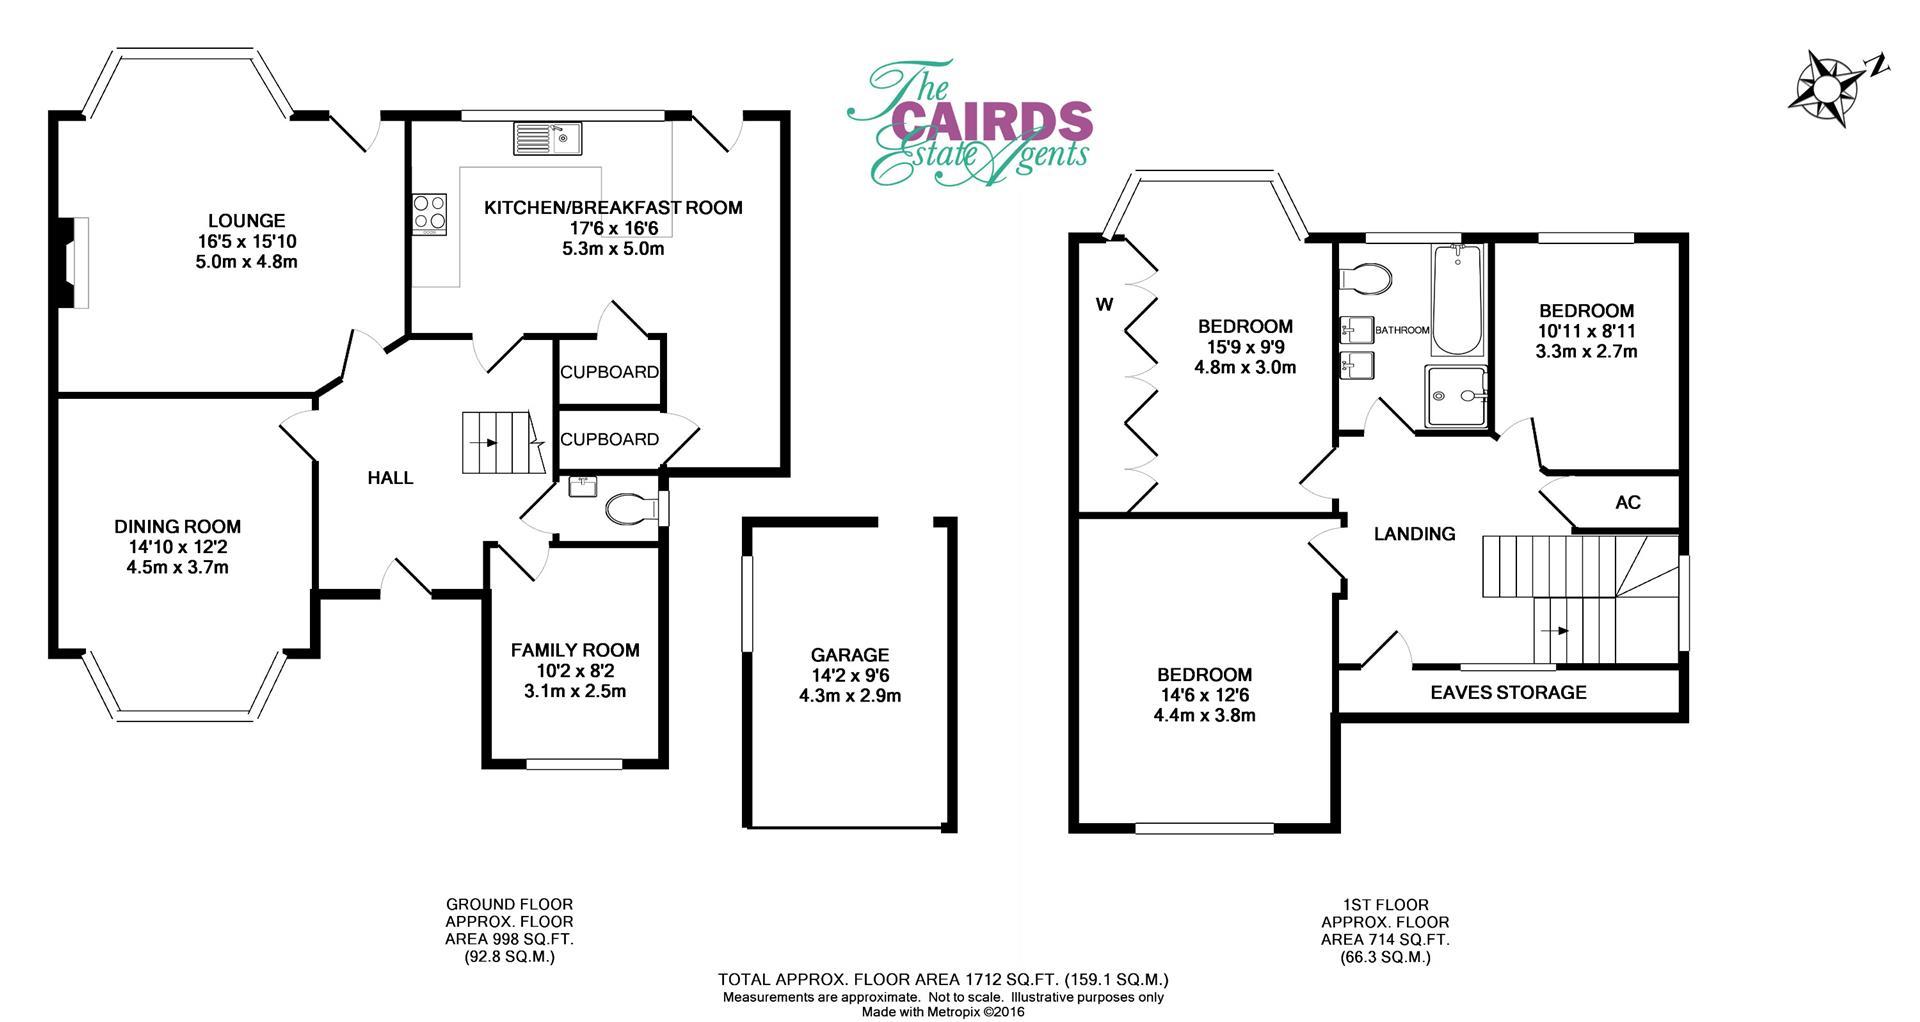 270 Fir Tree Road floor plan.jpg